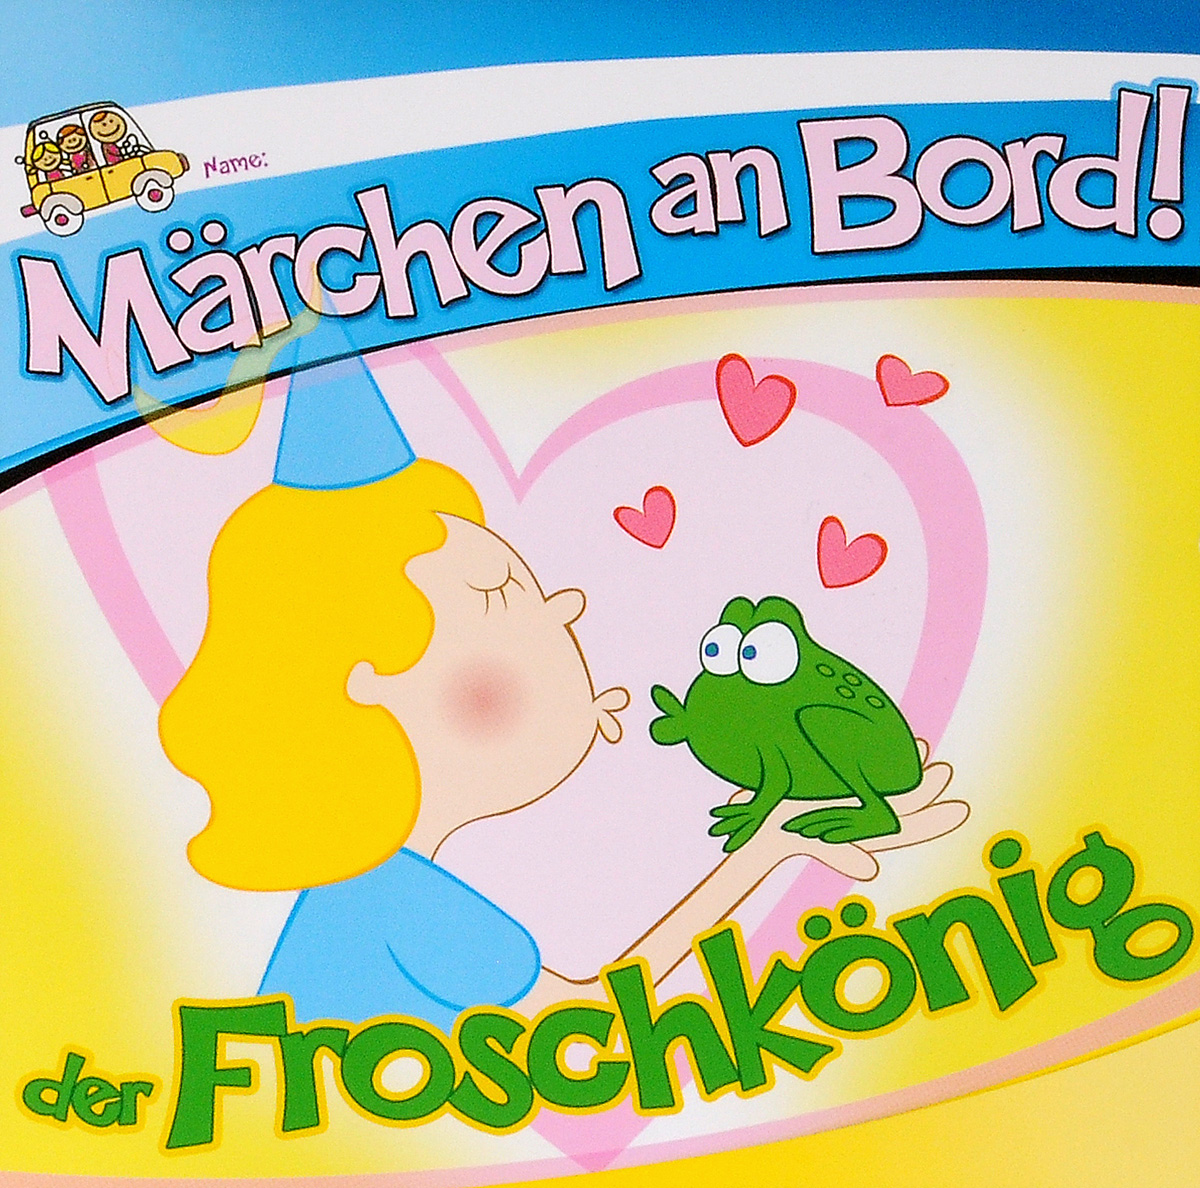 Marchen An Bord! Der Froschkonig